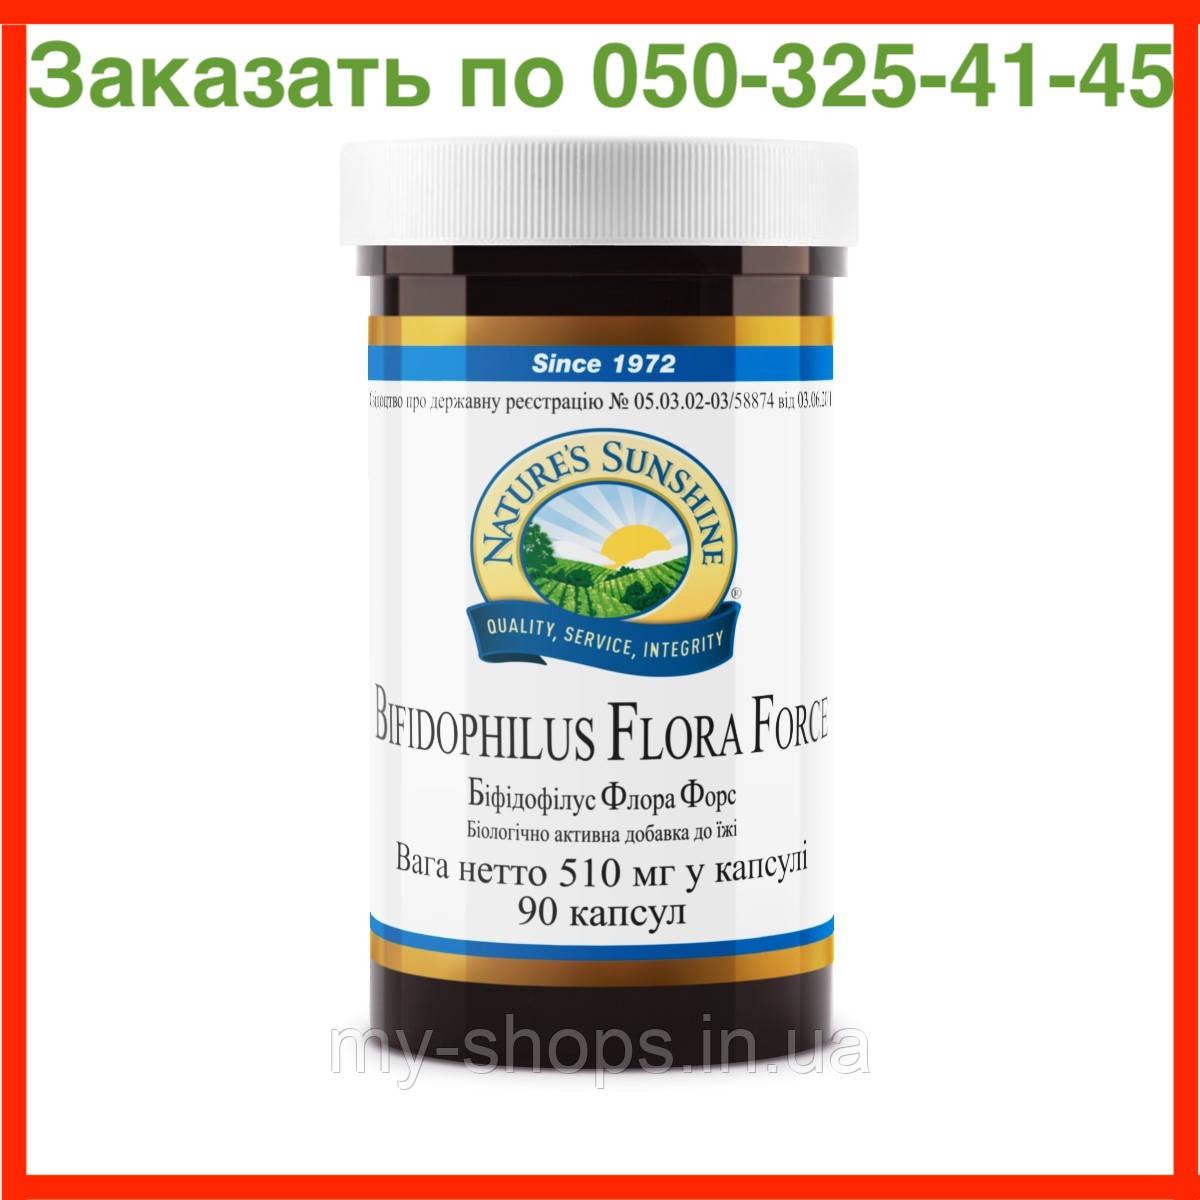 Бифидофилус Флора Форс (Bifidophilus Flora Force) НСП. Бифидофилус Флора Форс NSP. Натуральная Биодобавка